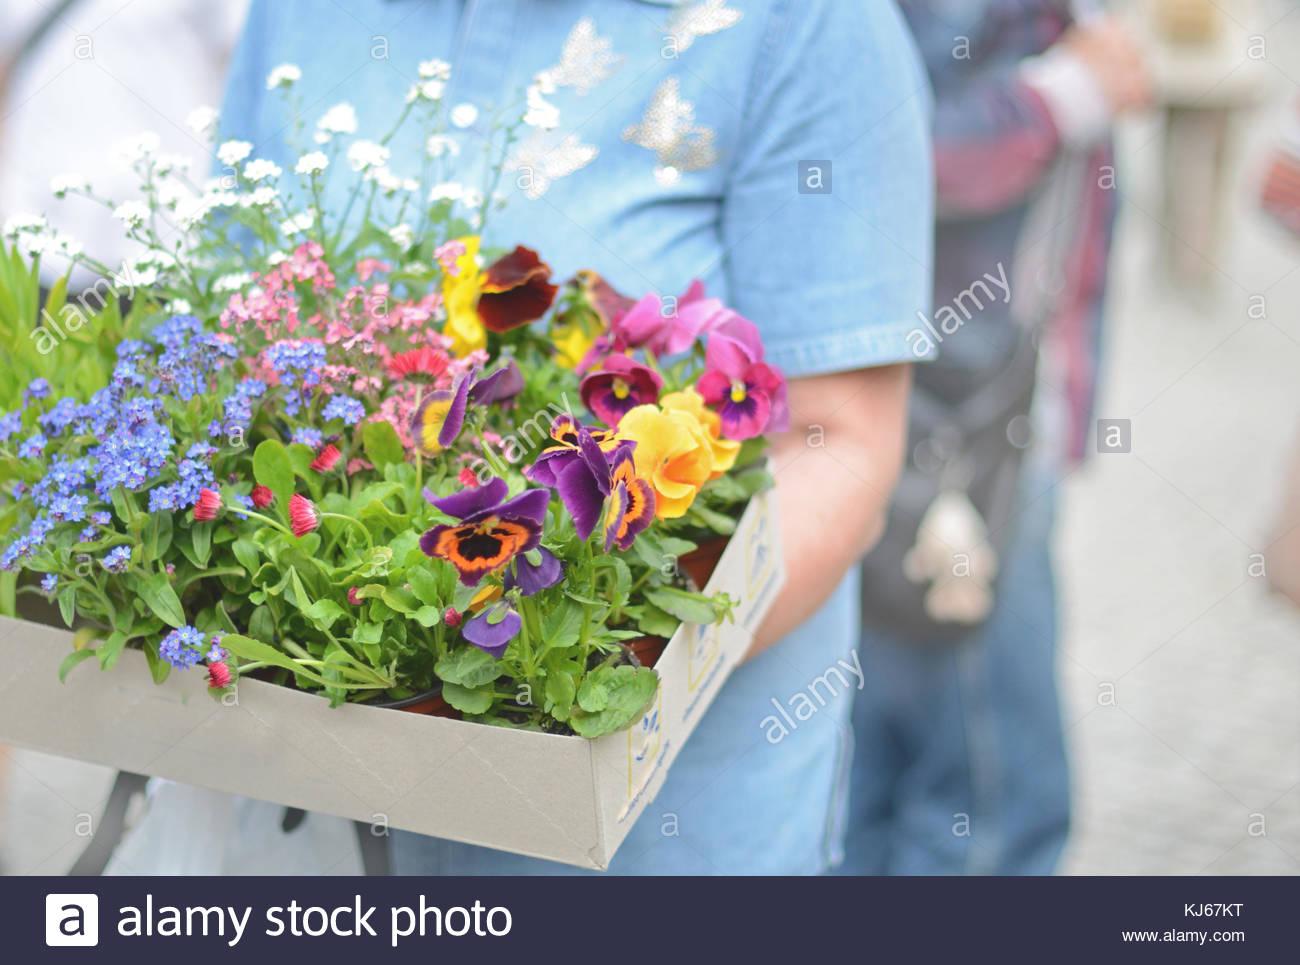 Box of flowers - Stock Image